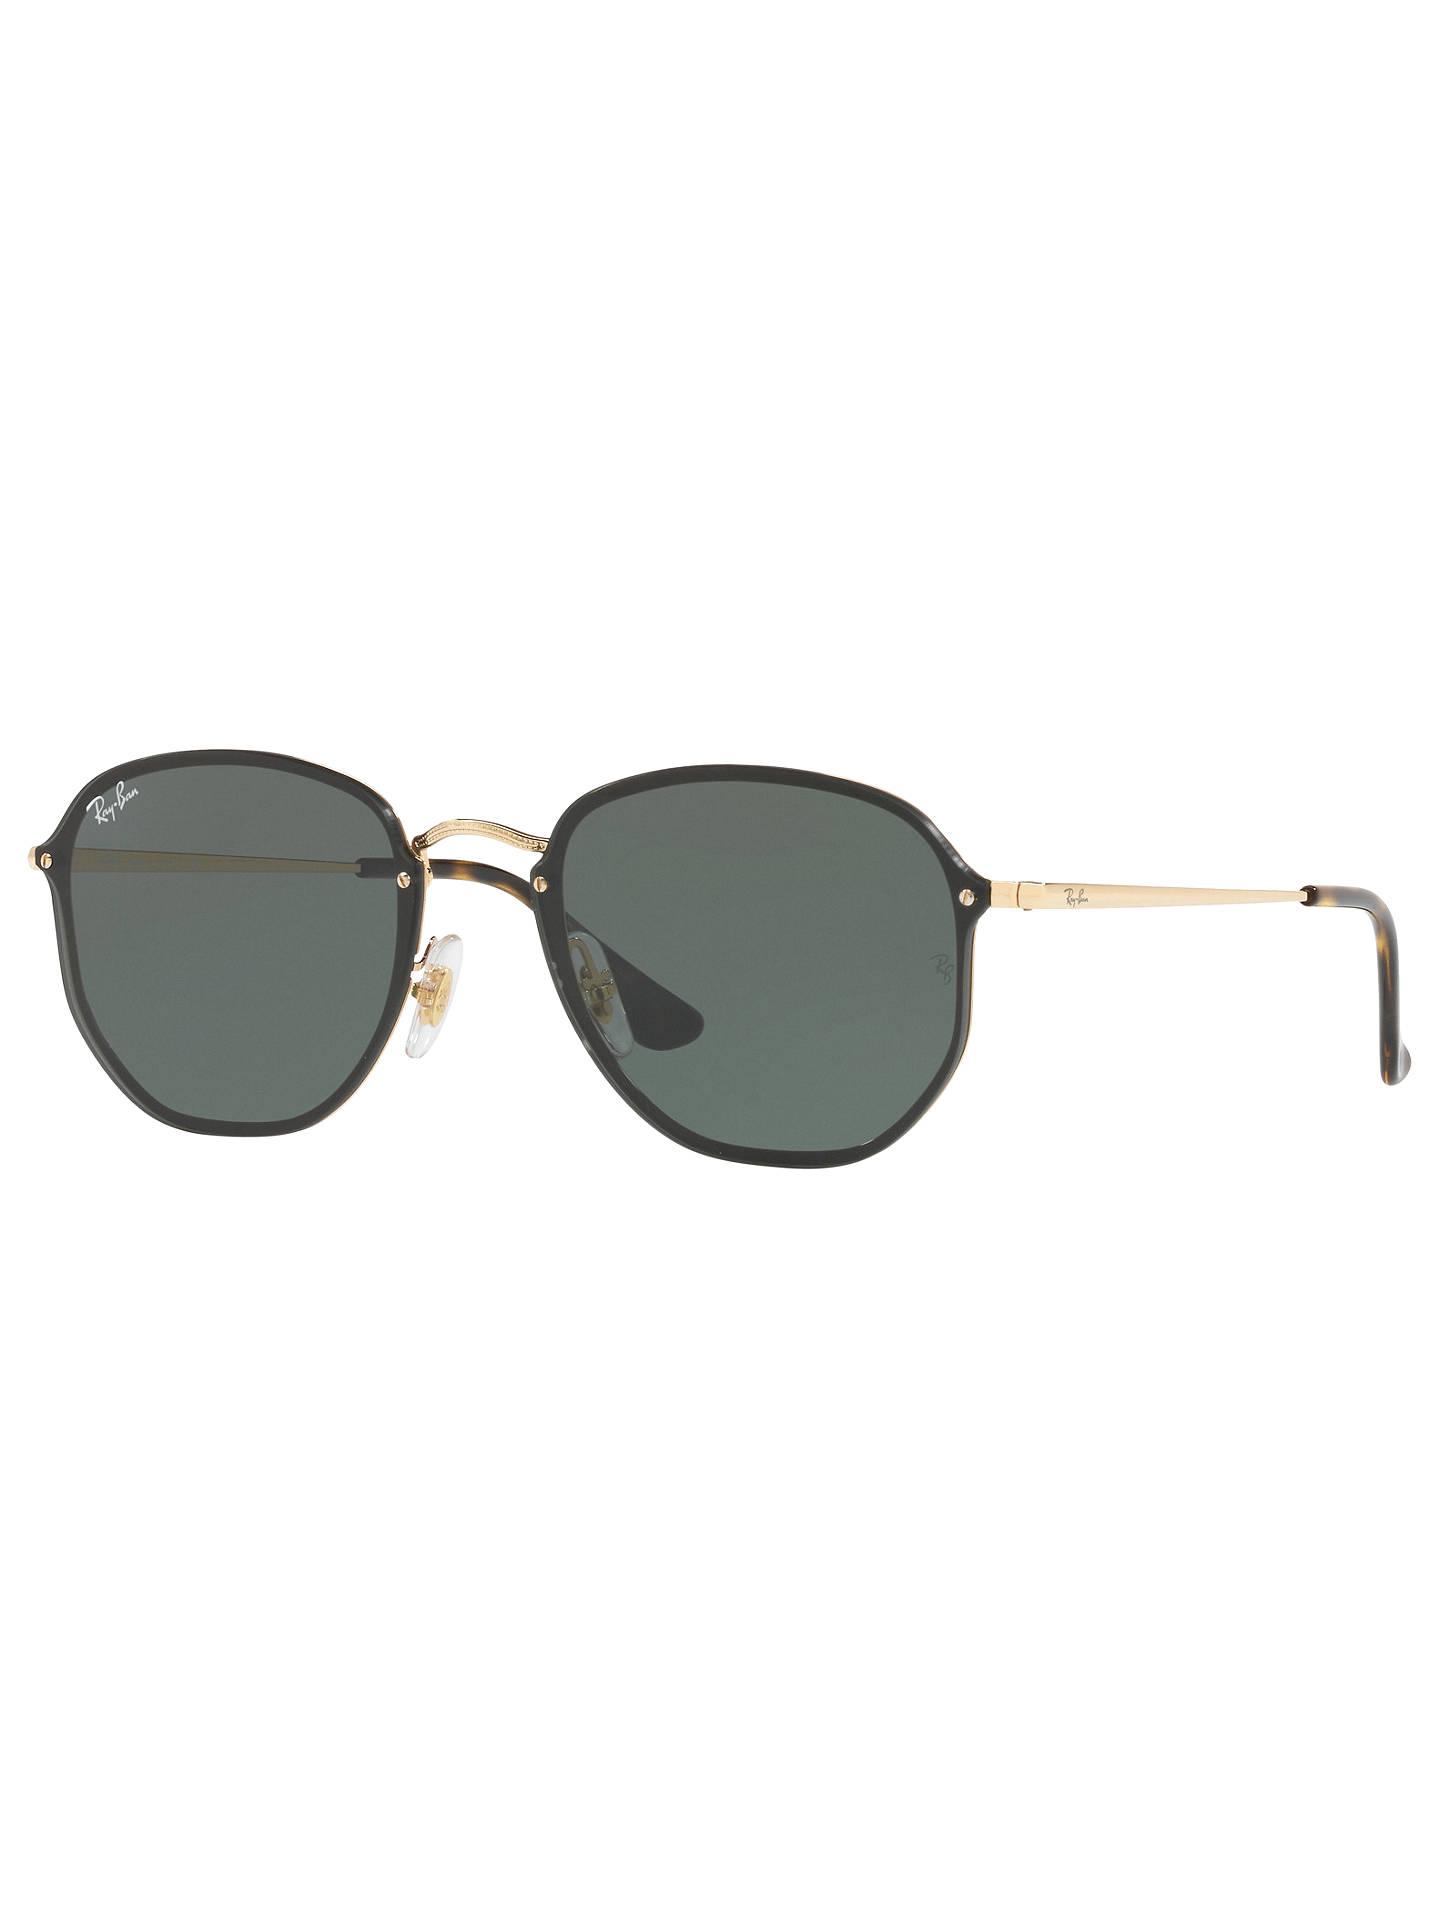 85a69ff2be BuyRay-Ban RB3579N Blaze Hexagonal Sunglasses